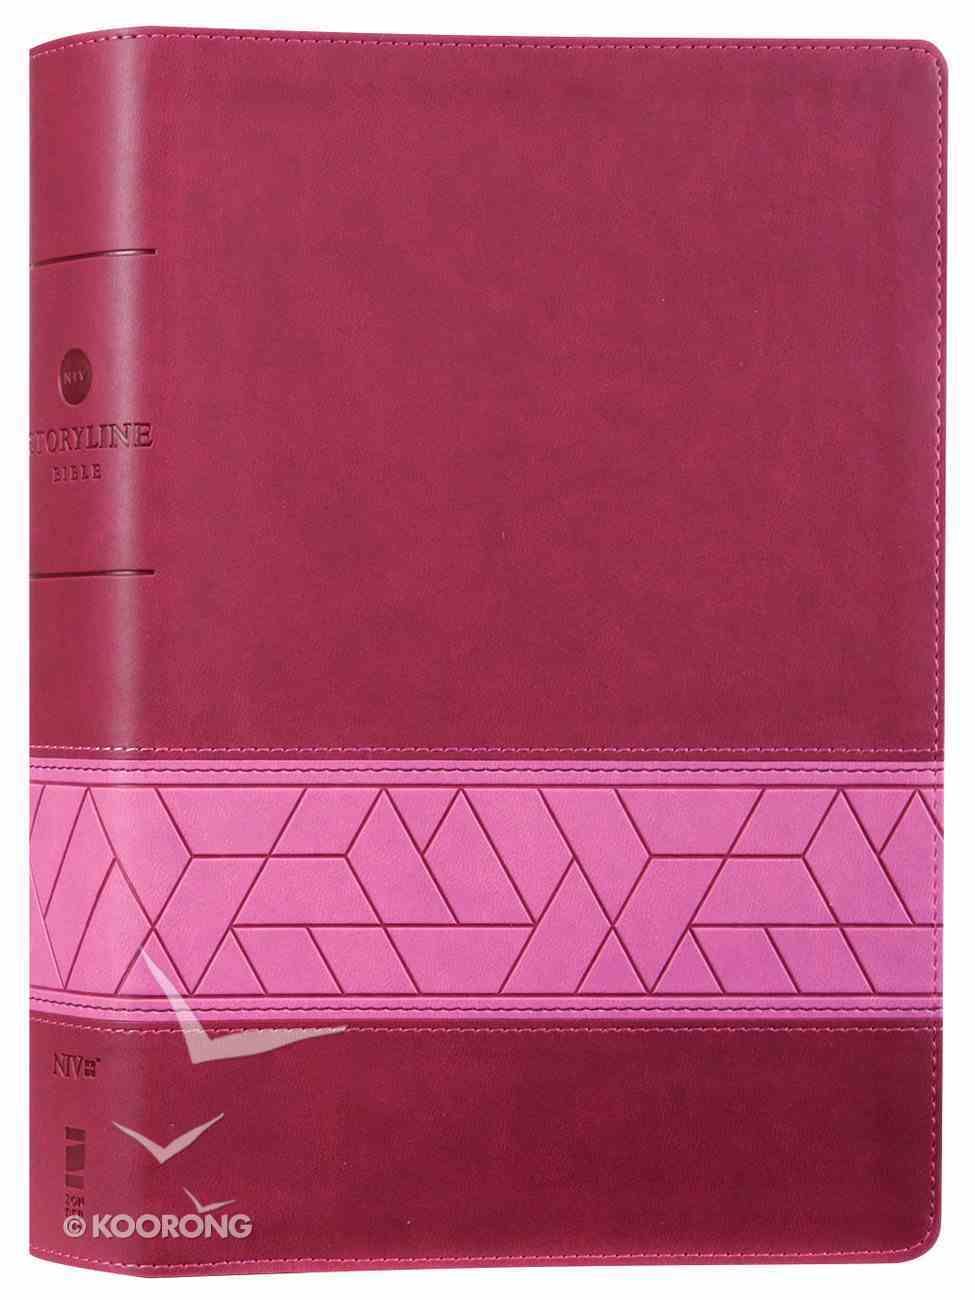 NIV Storyline Bible Pink Premium Imitation Leather